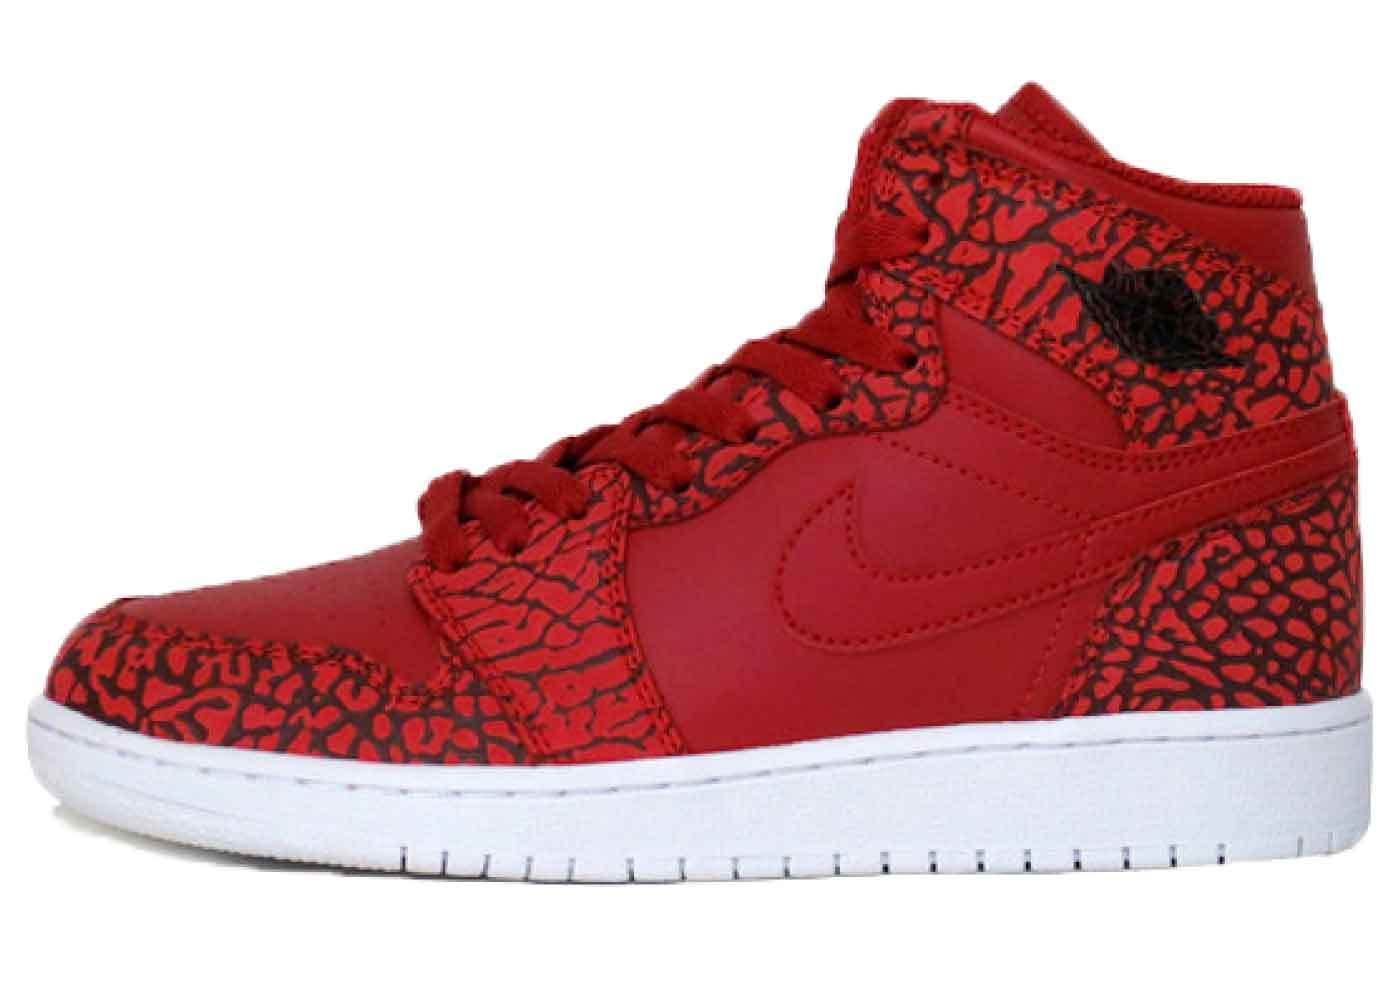 Nike Air Jordan 1 Retro Red Elephant Printの写真